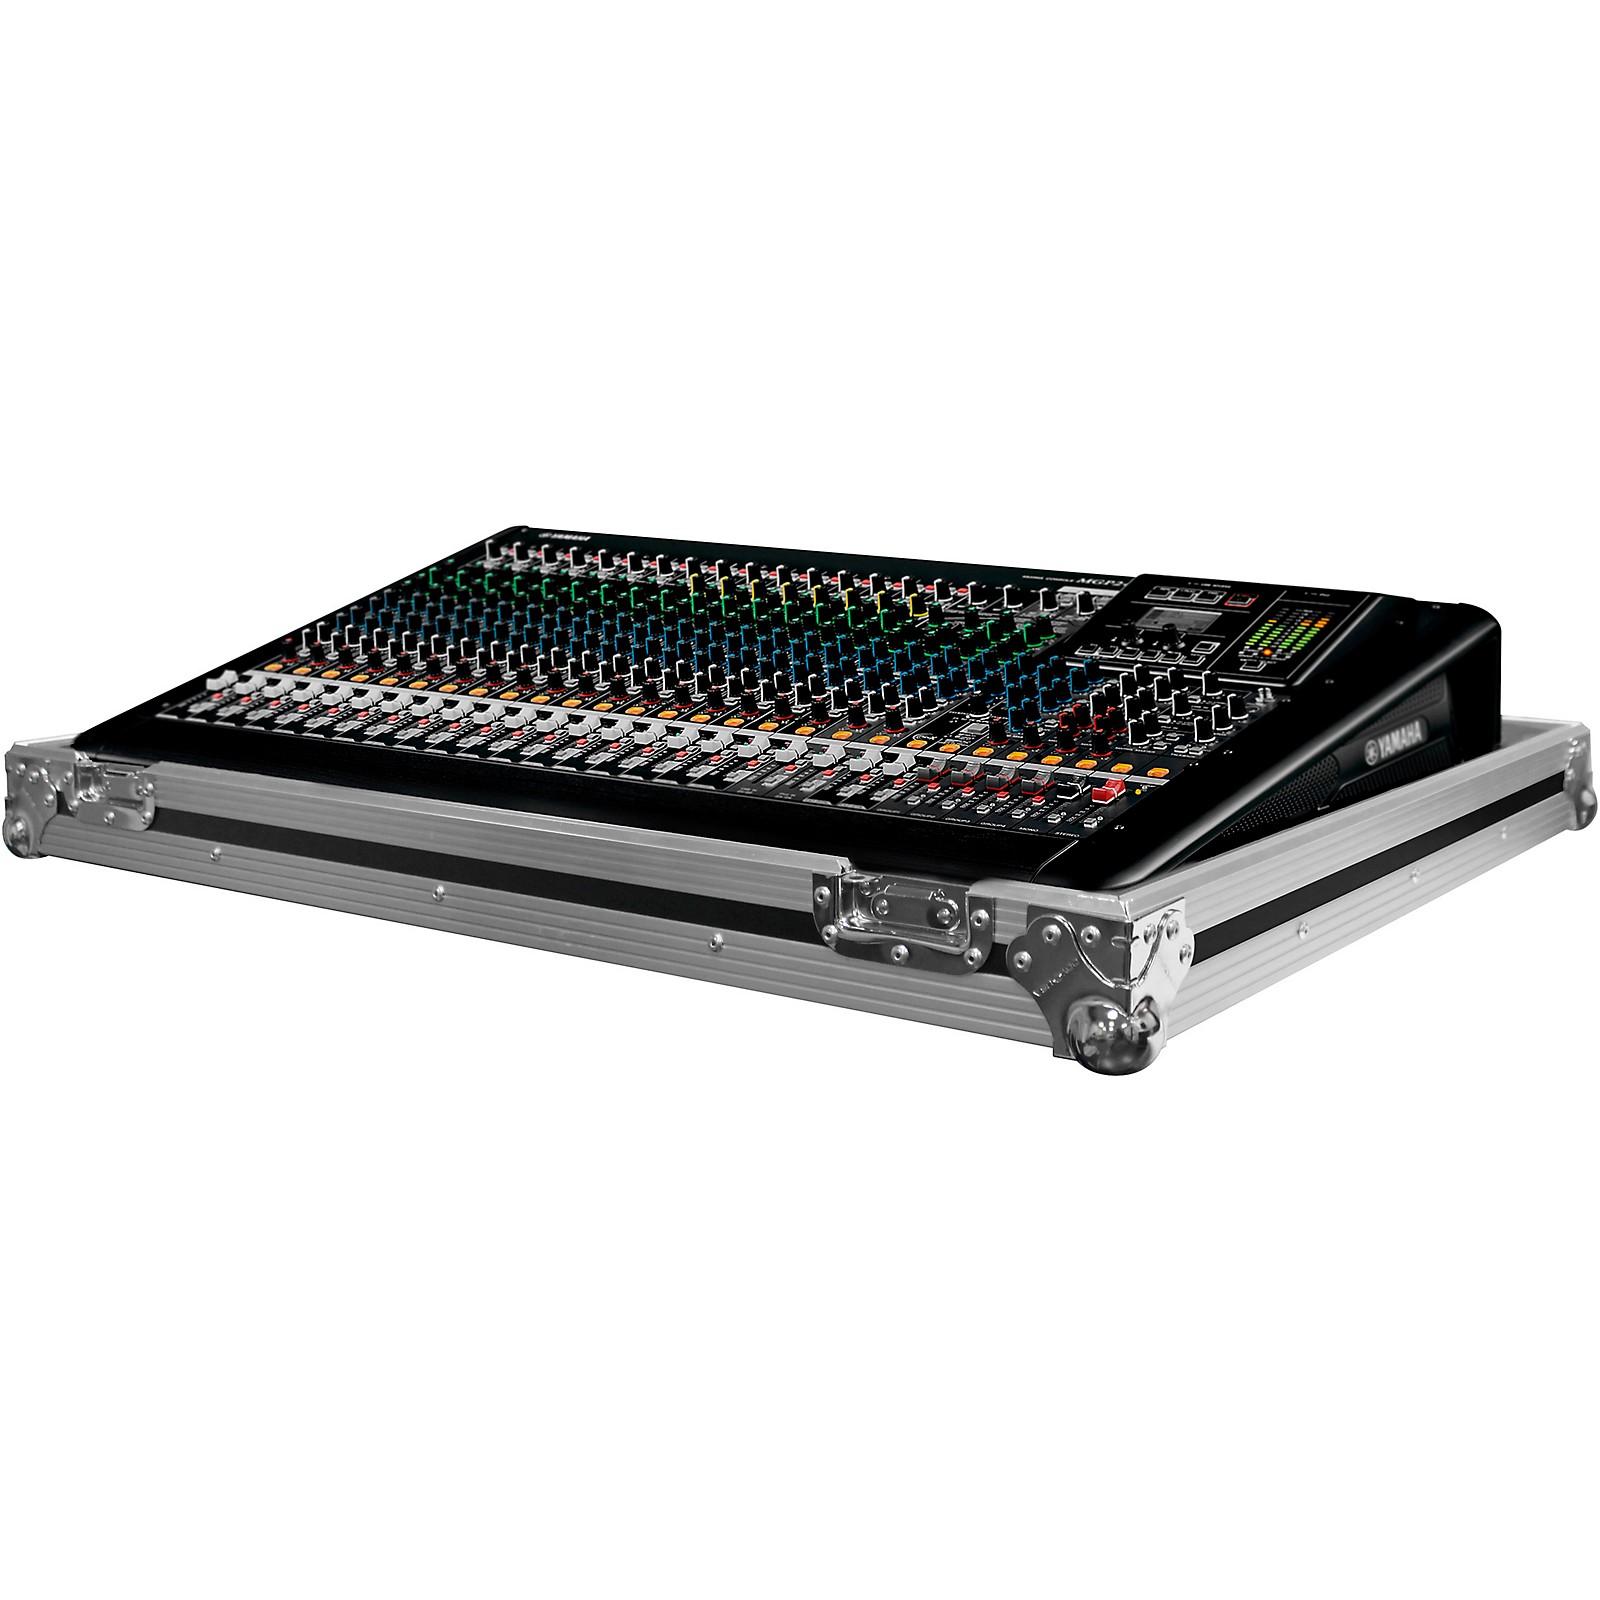 Odyssey FZMGP32XW Yamaha MGP 32X Mixing Console Case with Wheels